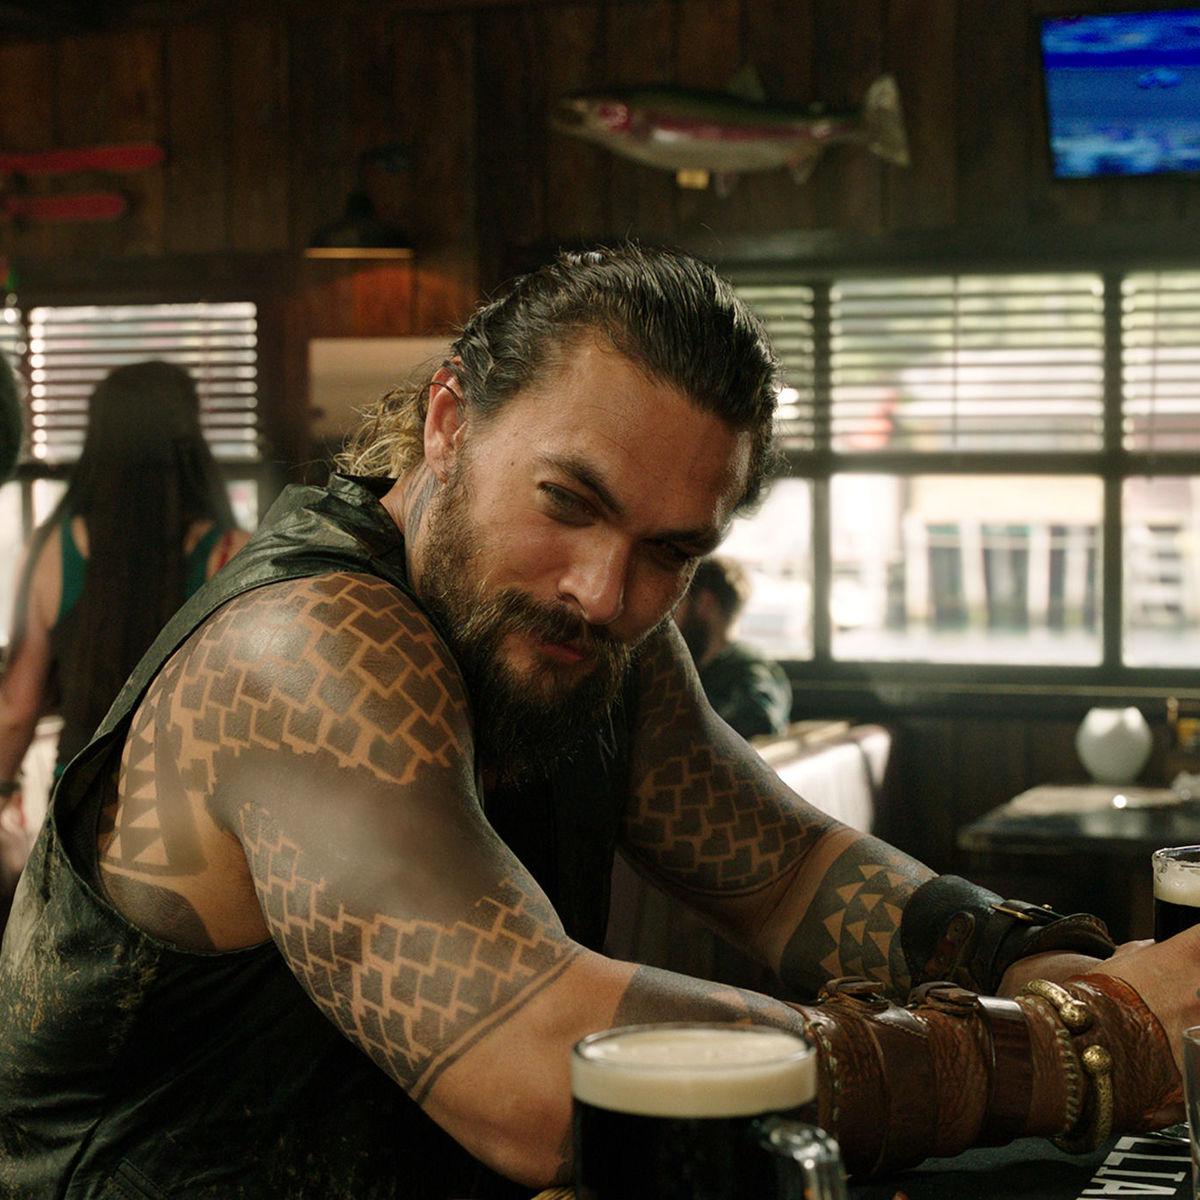 Aquaman rises to $940 million worldwide as Bumblebee tops China box office